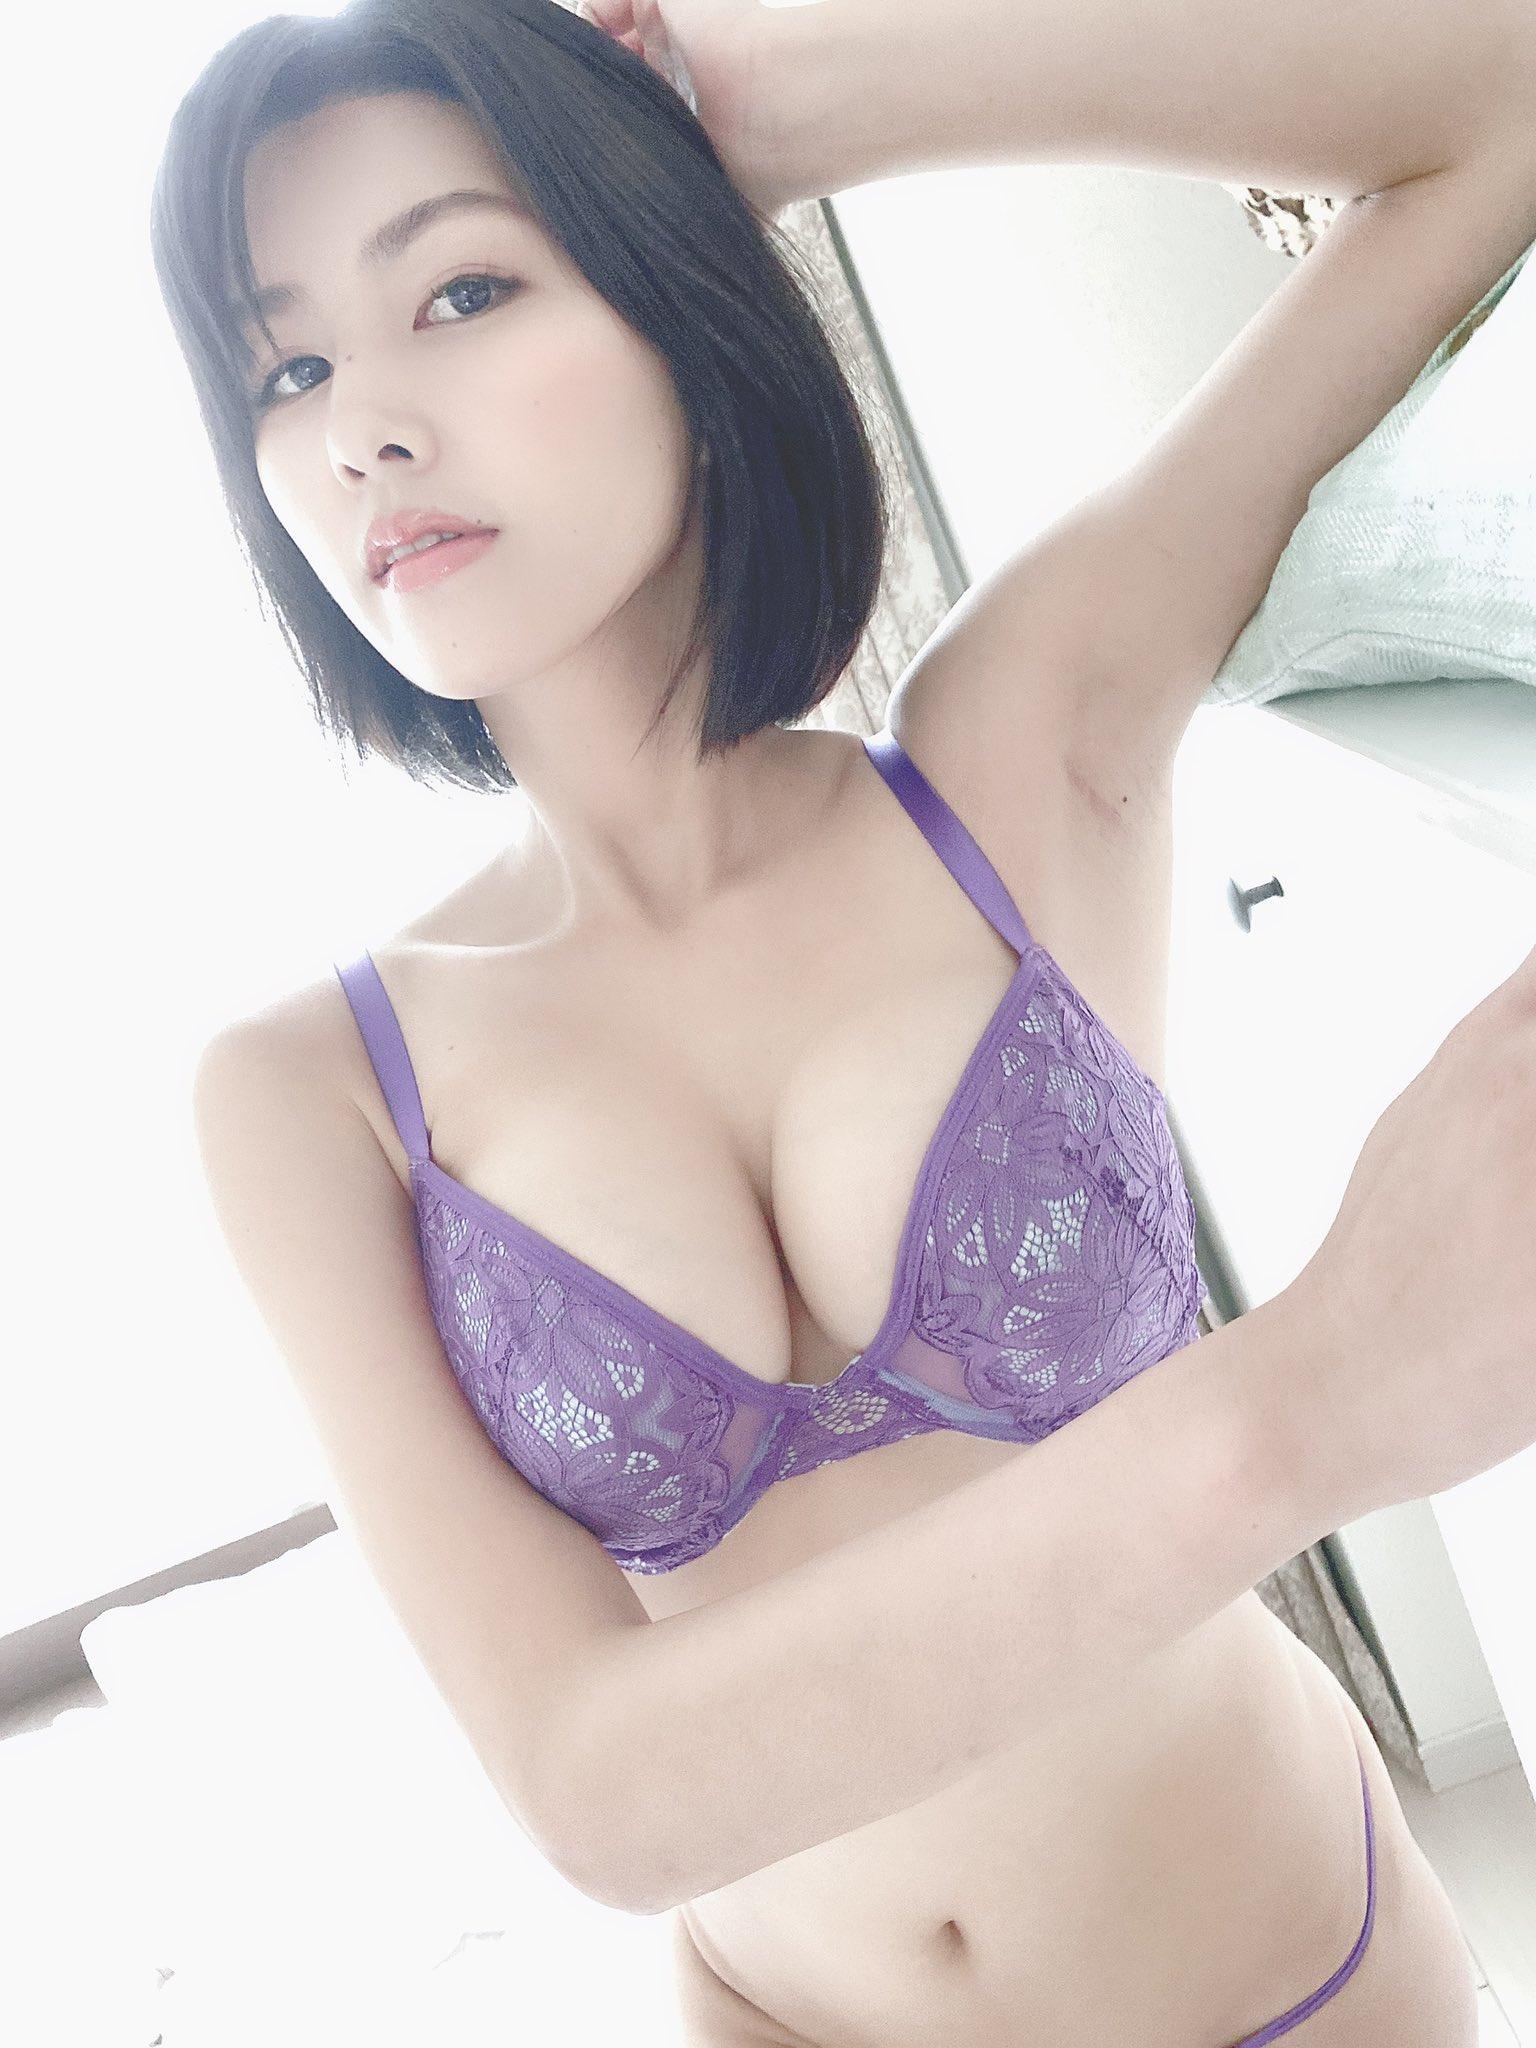 [DAHLIA] Mino Suzume 美乃 すずめ - ScanLover 2.0 - Discuss JAV